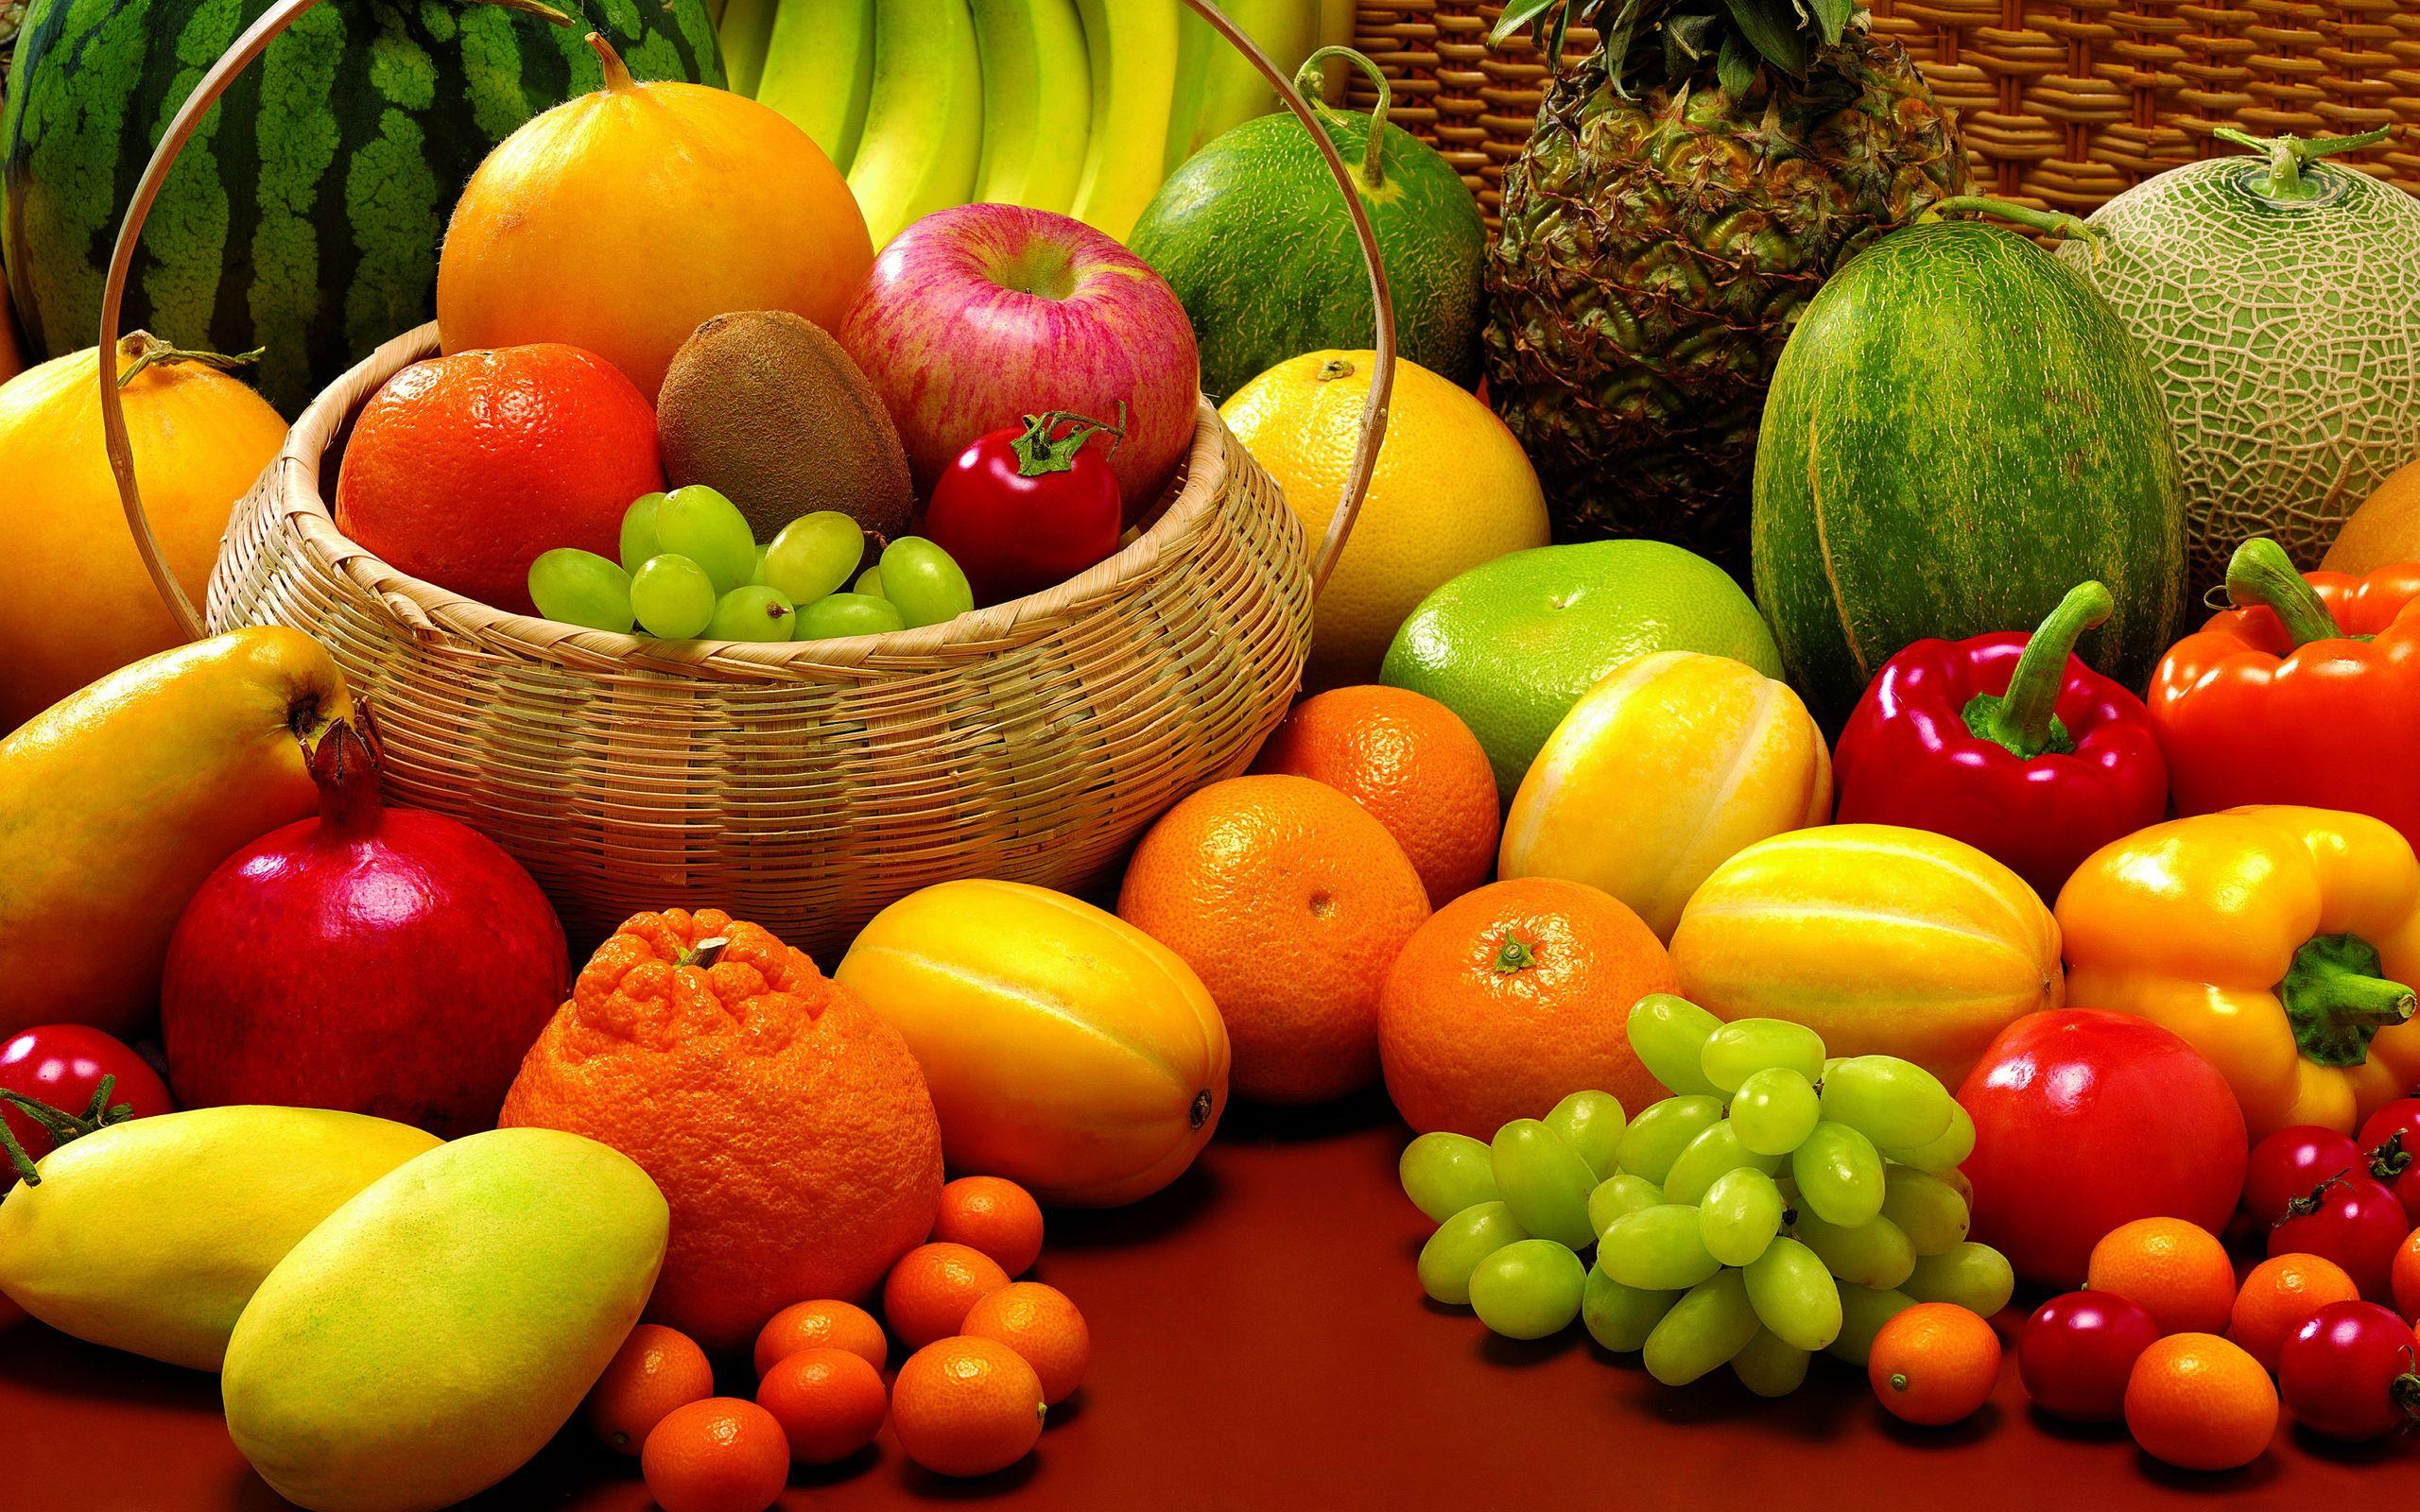 Fruit Wallpaper HD Downloads 2560x1600